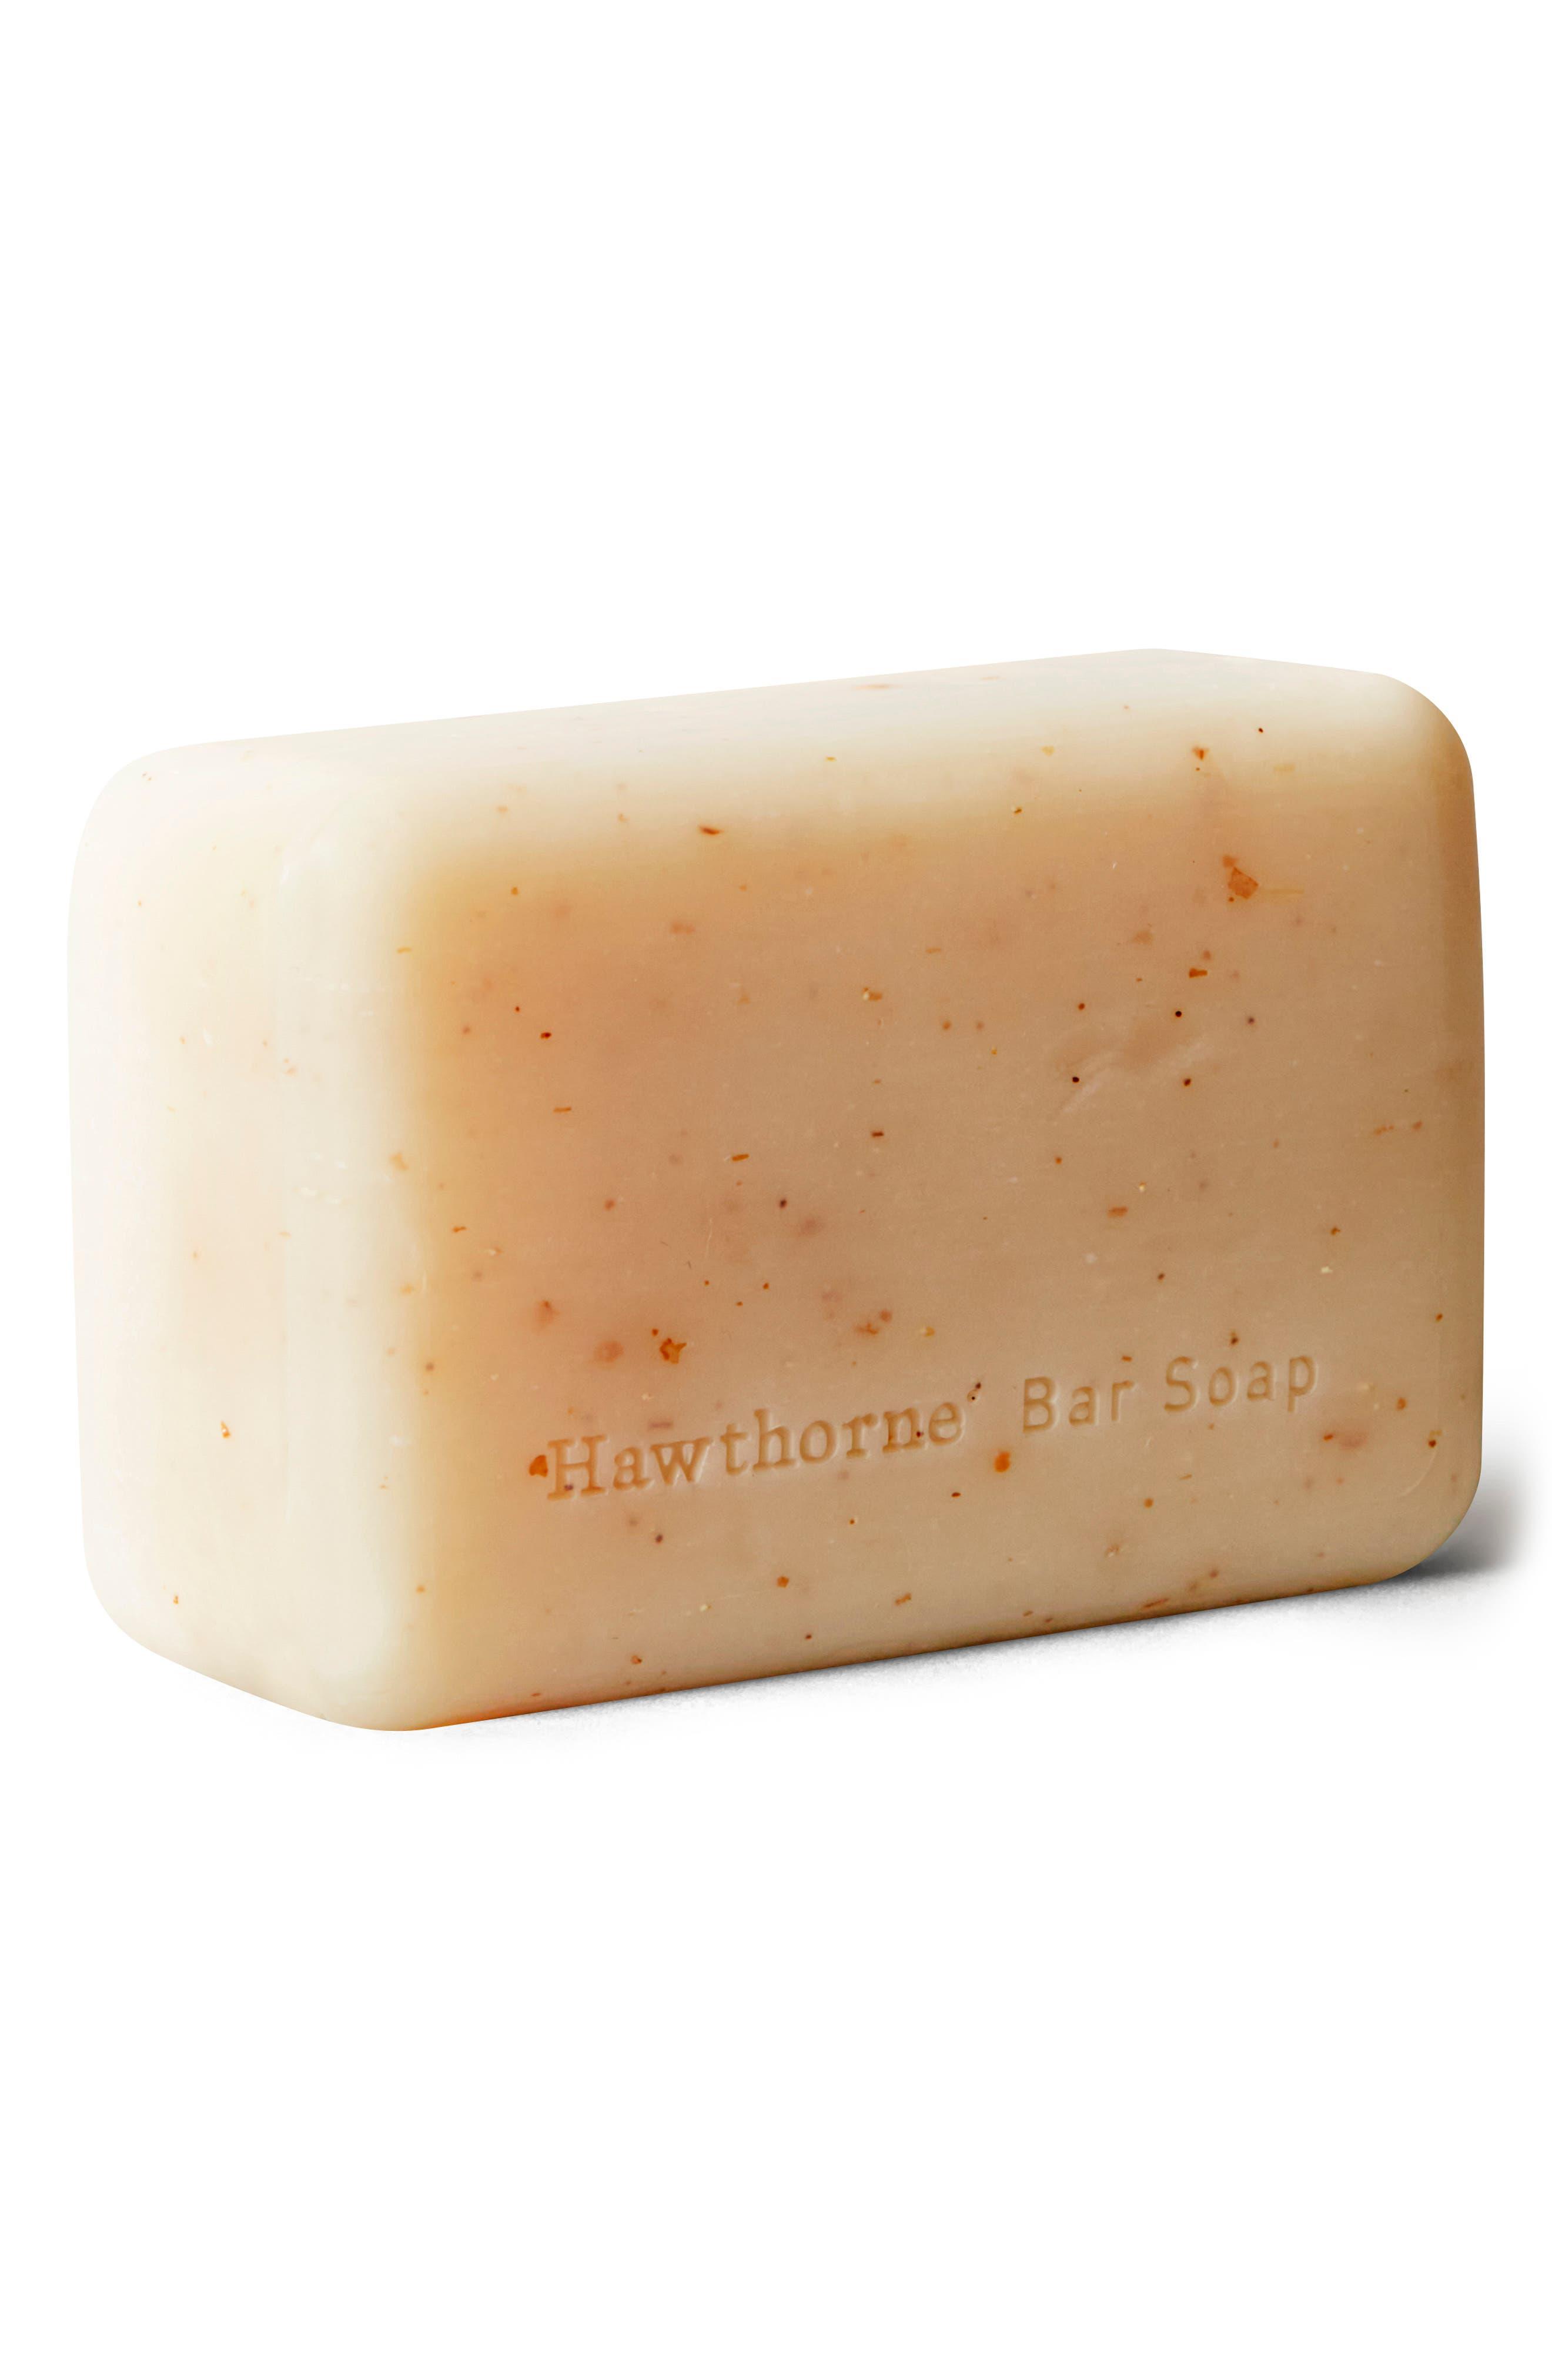 Exfoliating Bar Soap